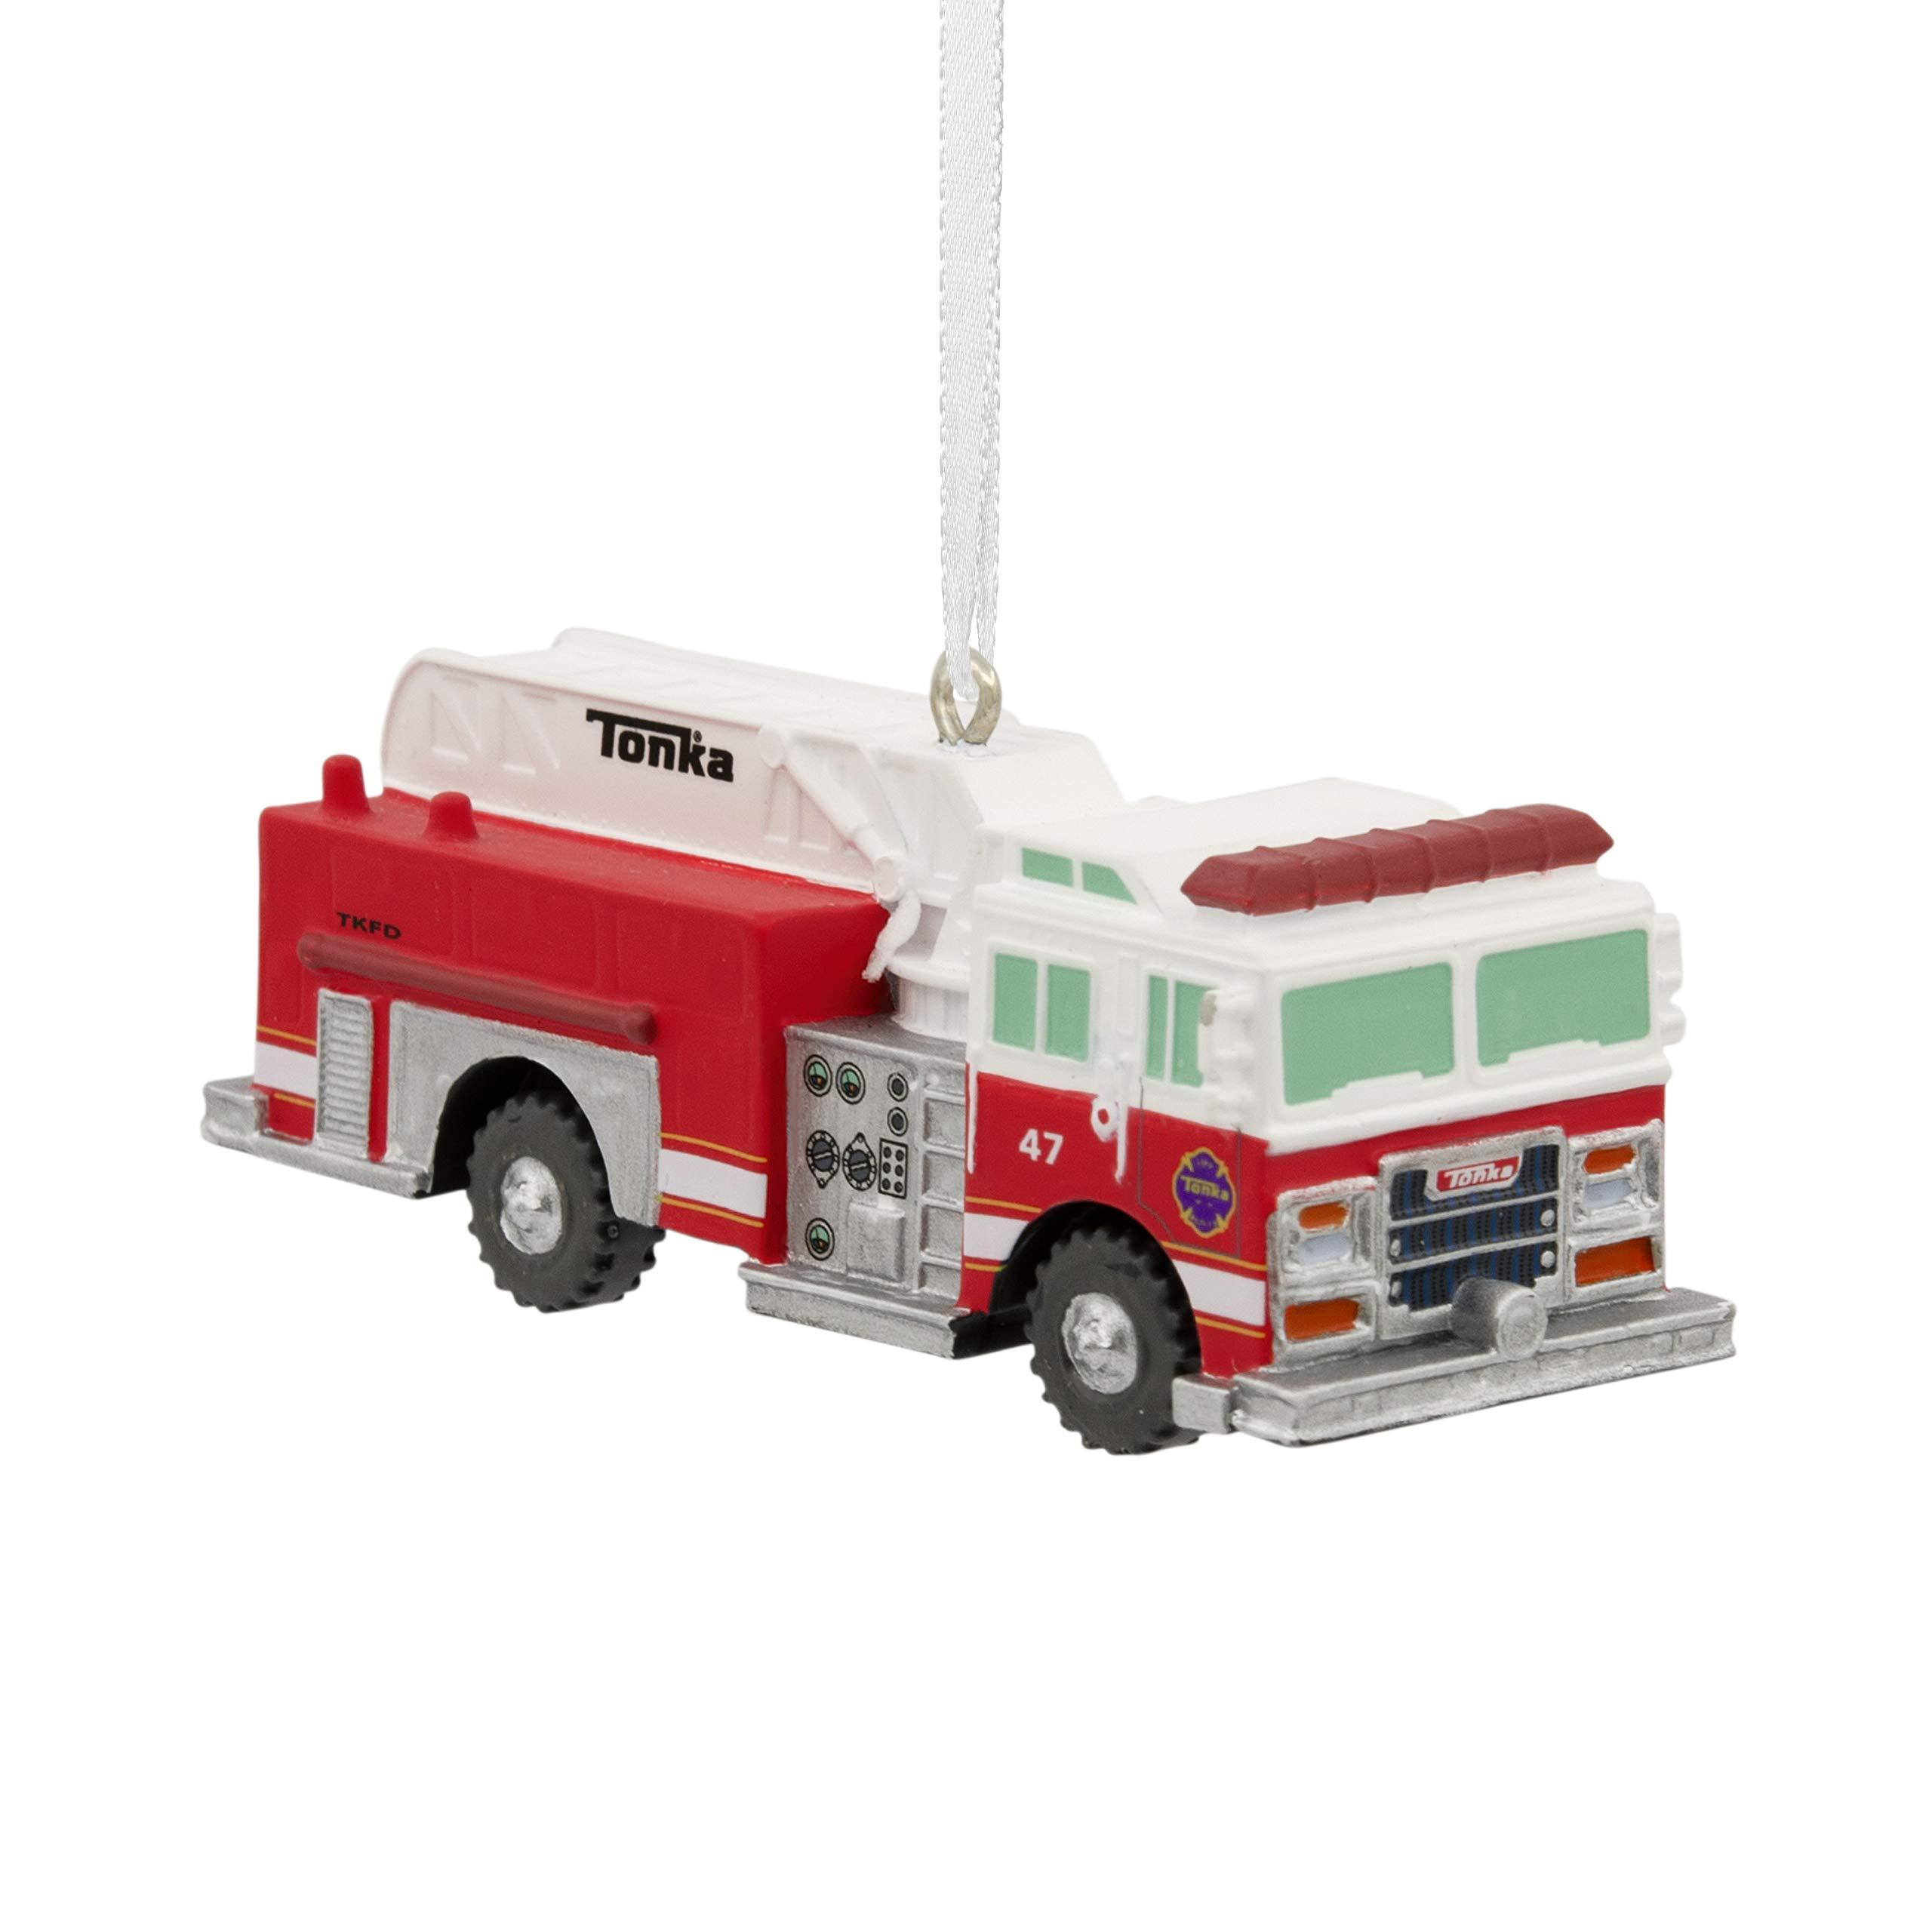 Hallmark Christmas Ornaments, Tonka Fire Truck Ornament